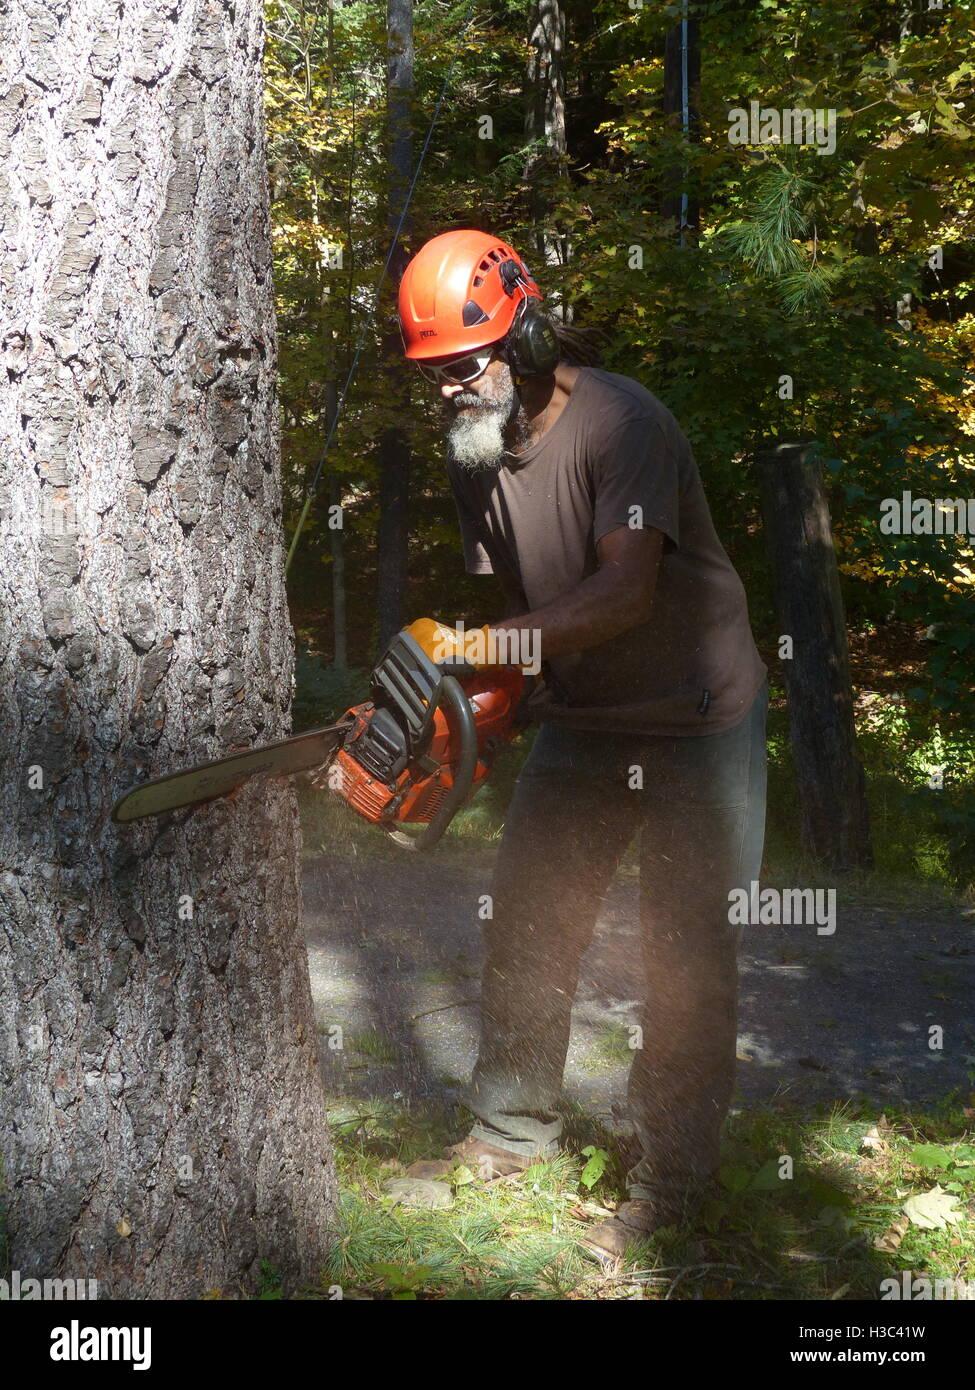 Lumberjack cutting down pine tree with Husqvarna chain saw - Stock Image